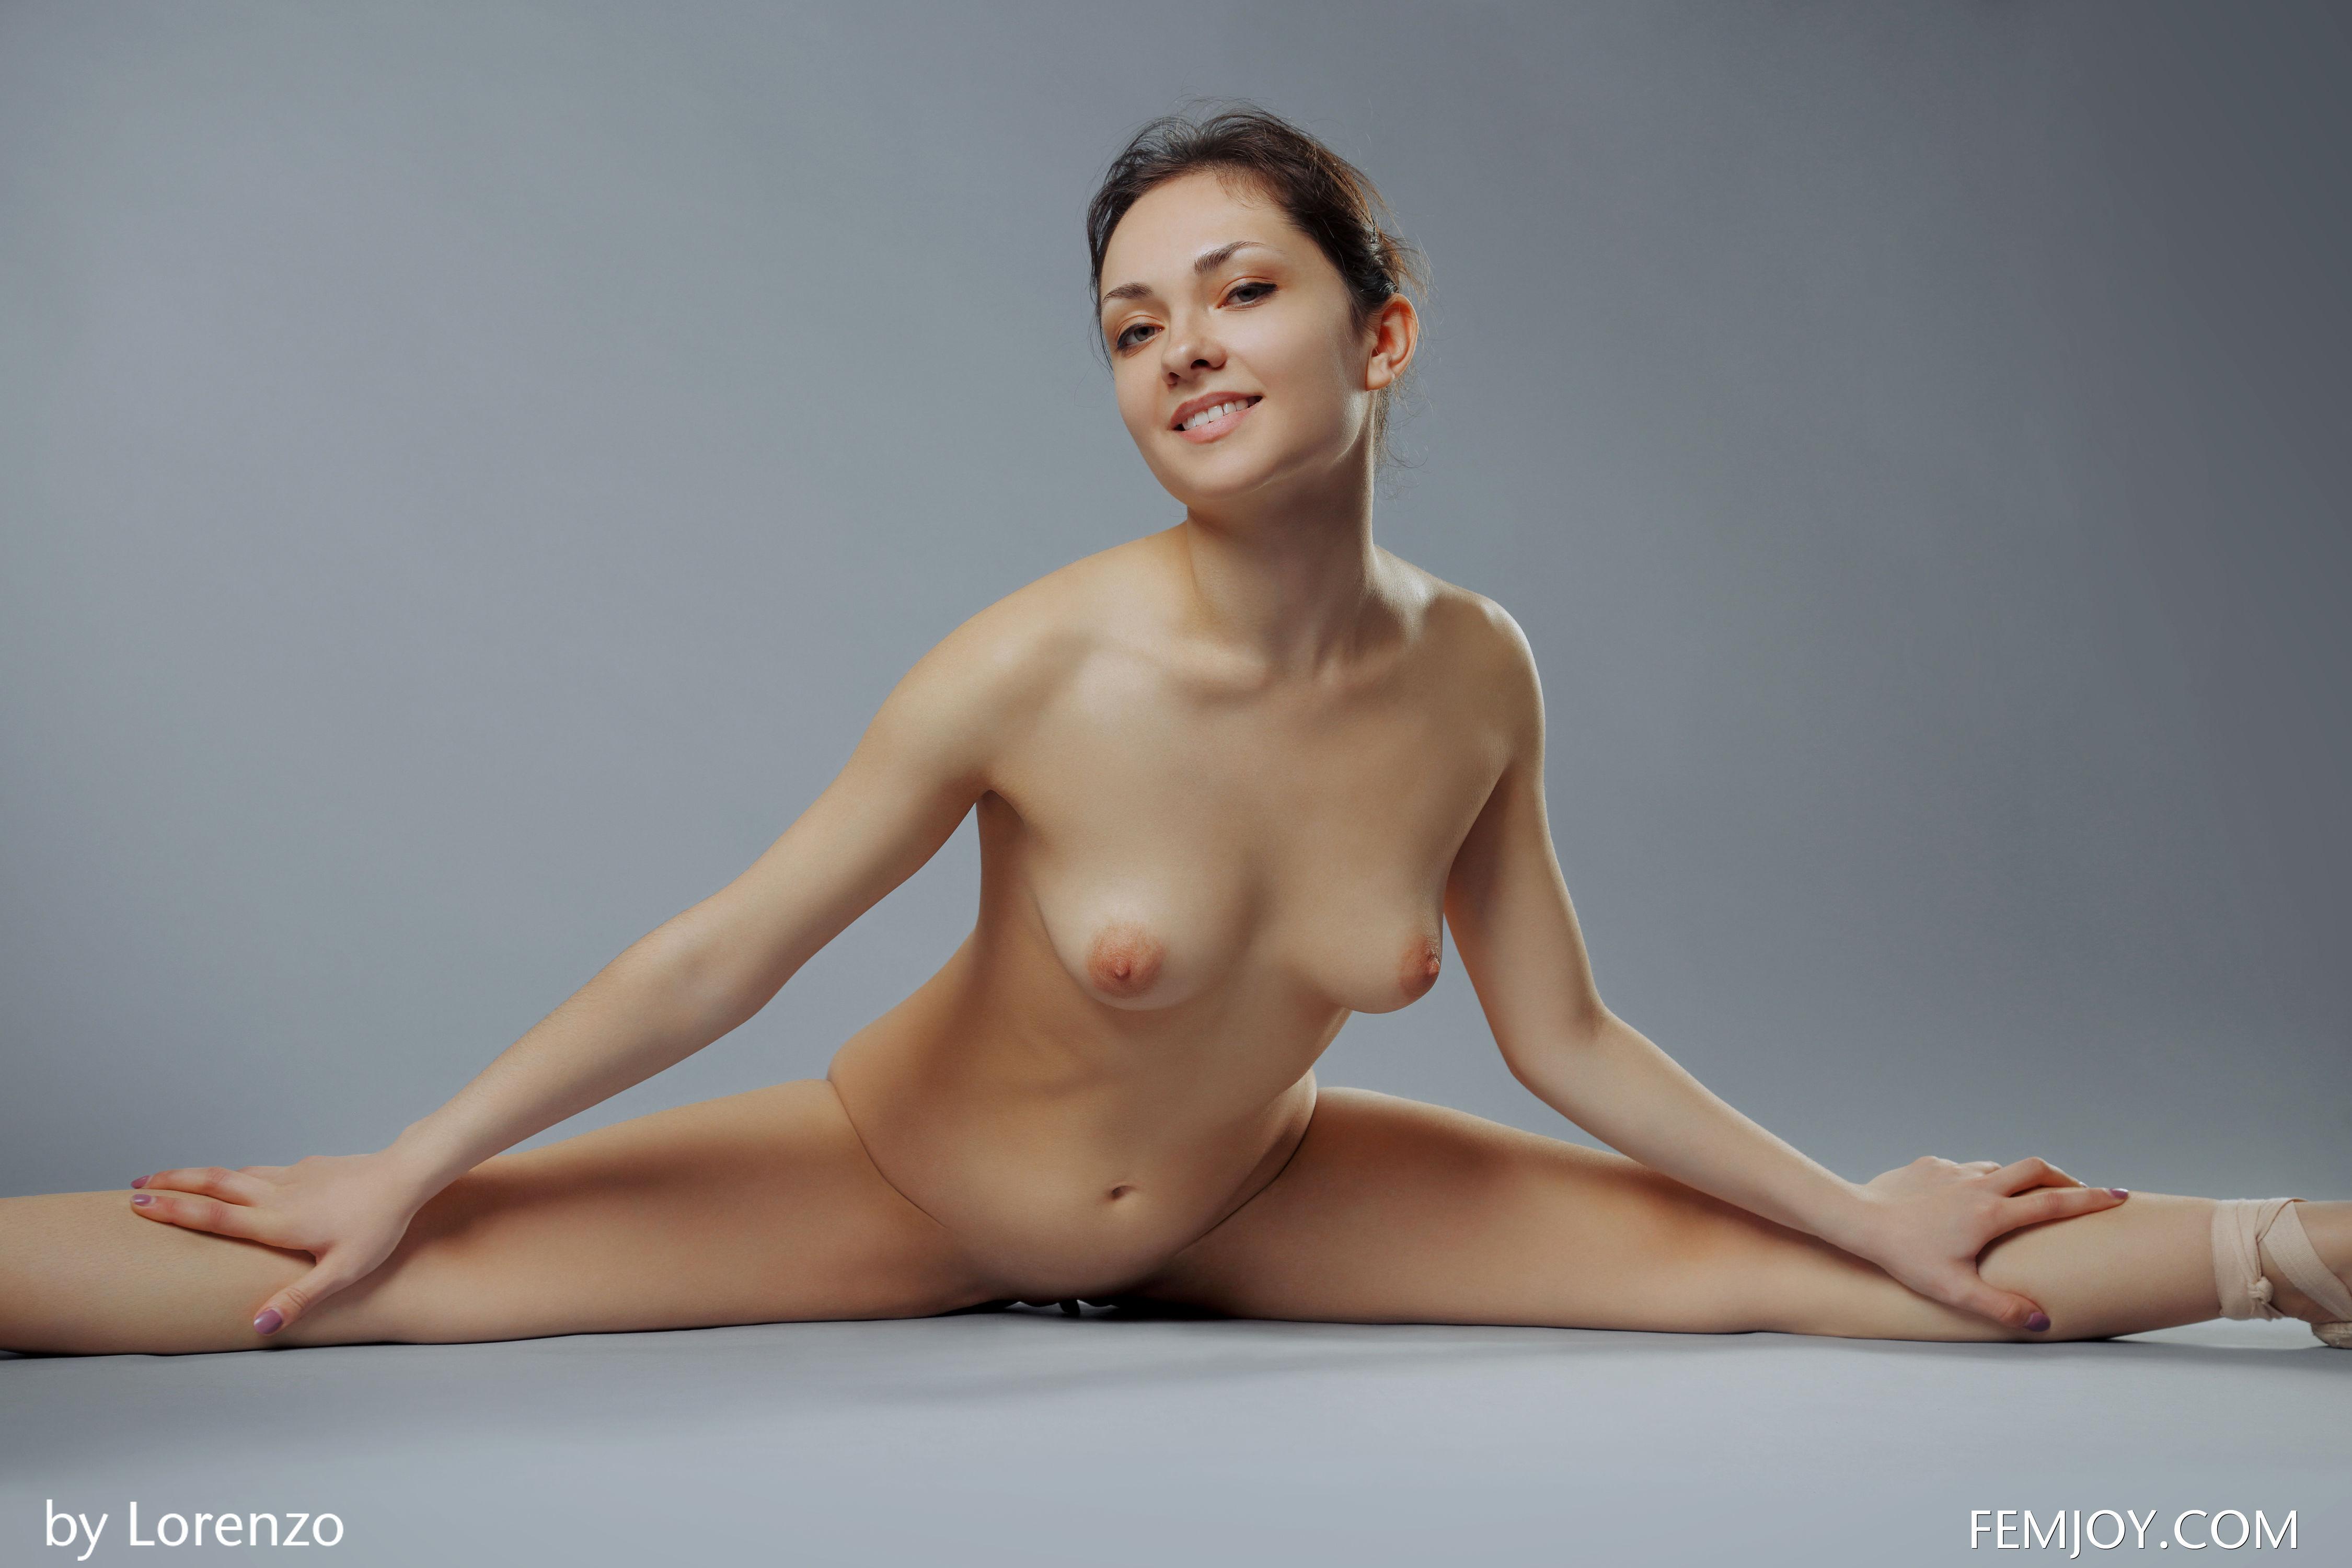 Sexnewsru  Ежедневный сексжурнал Все про секс и о сексе